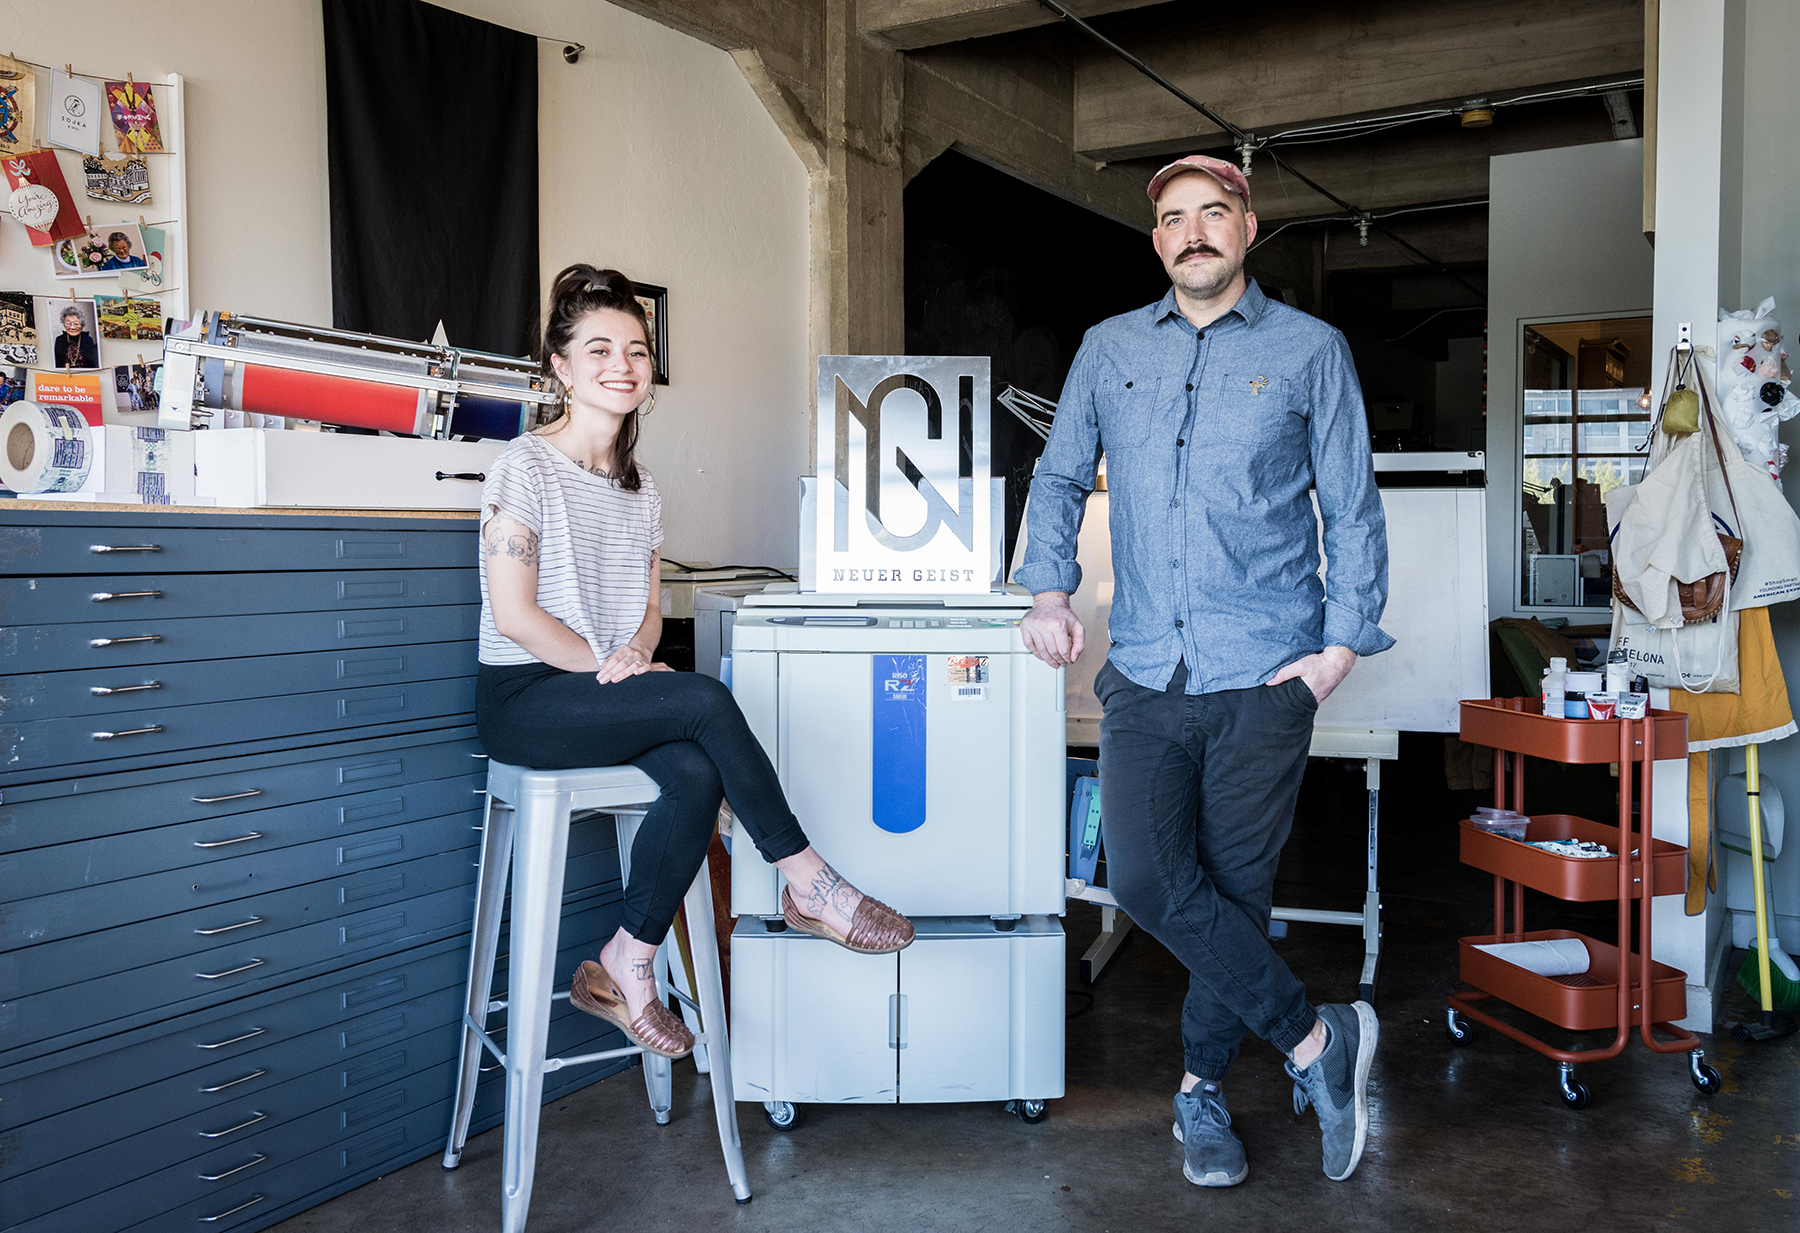 (L–R) Brighton Ballard and Derek Ballard flex their design and branding prowess with their risograph machines. Photo: Colton Marsala